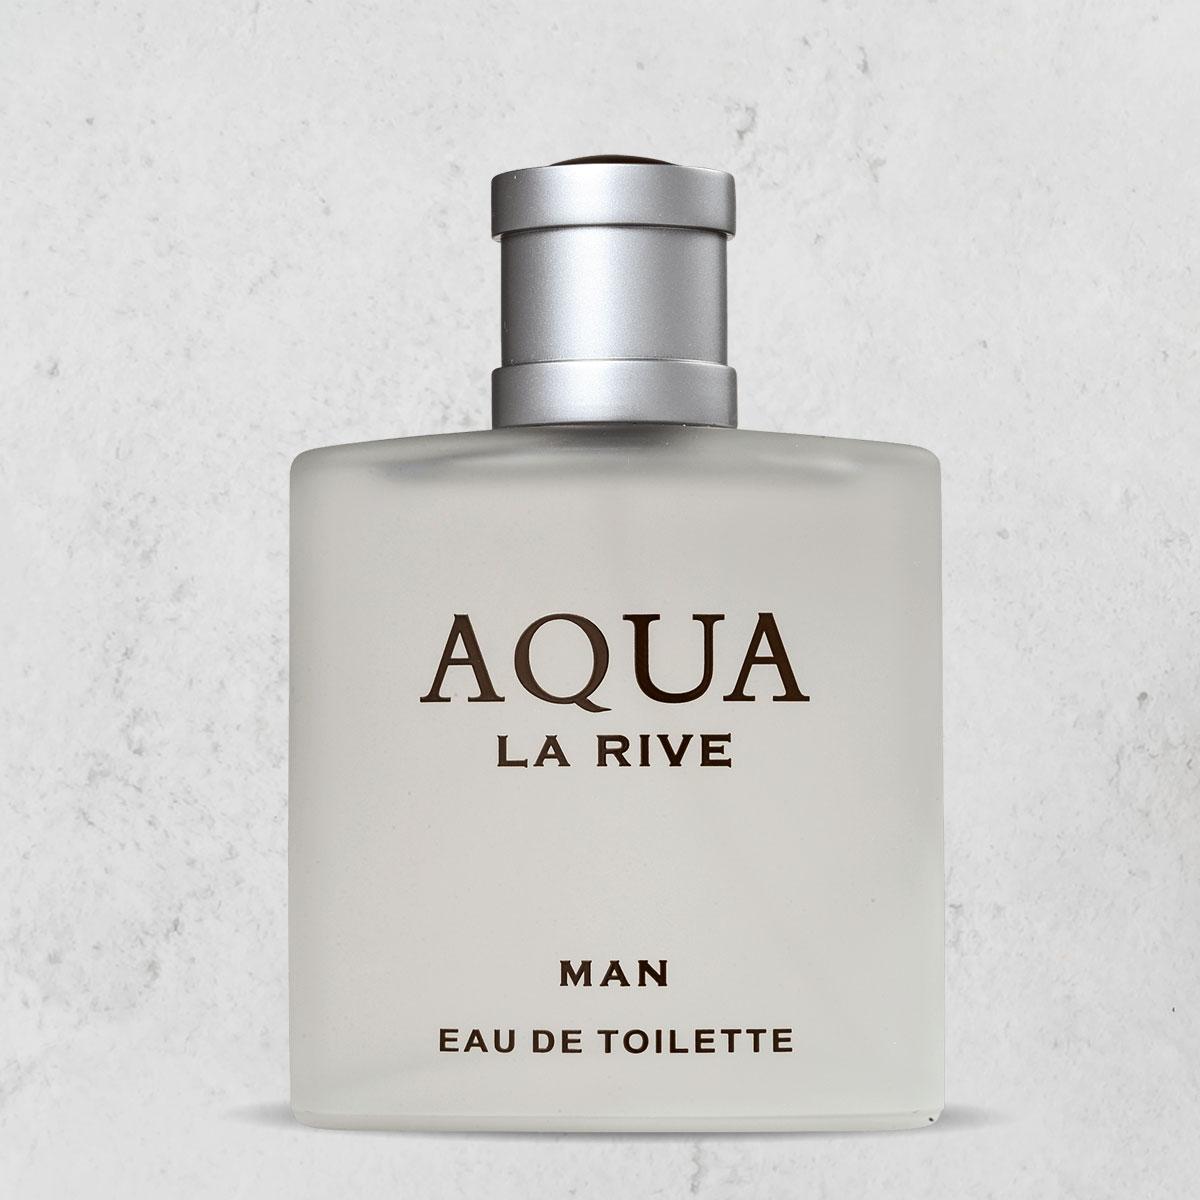 Perfume Aqua Man Masculino Edt 90ml La Rive